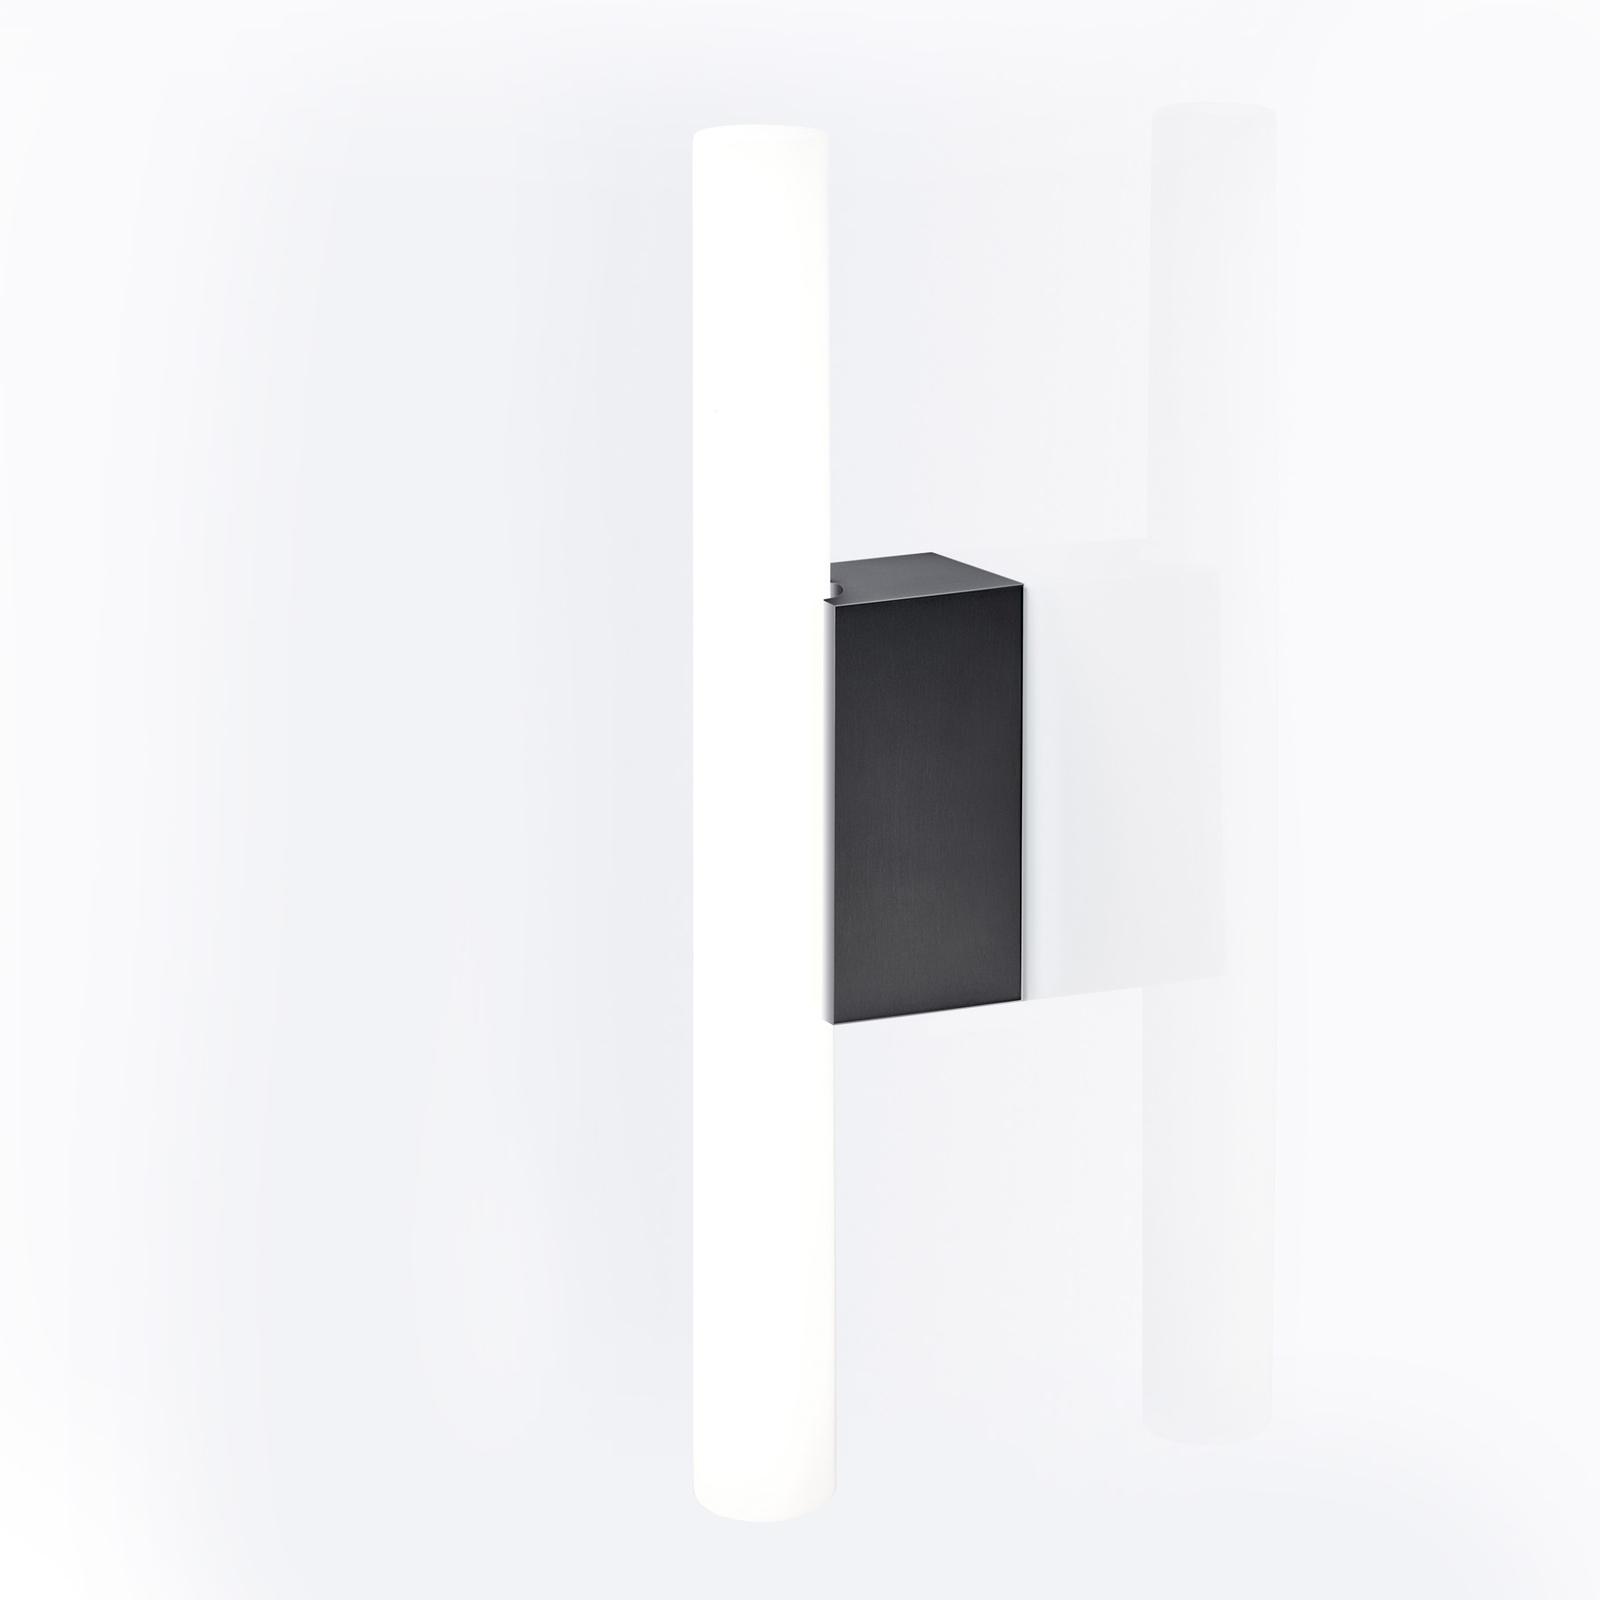 Decor Walther Omega 2 wandlamp zwart